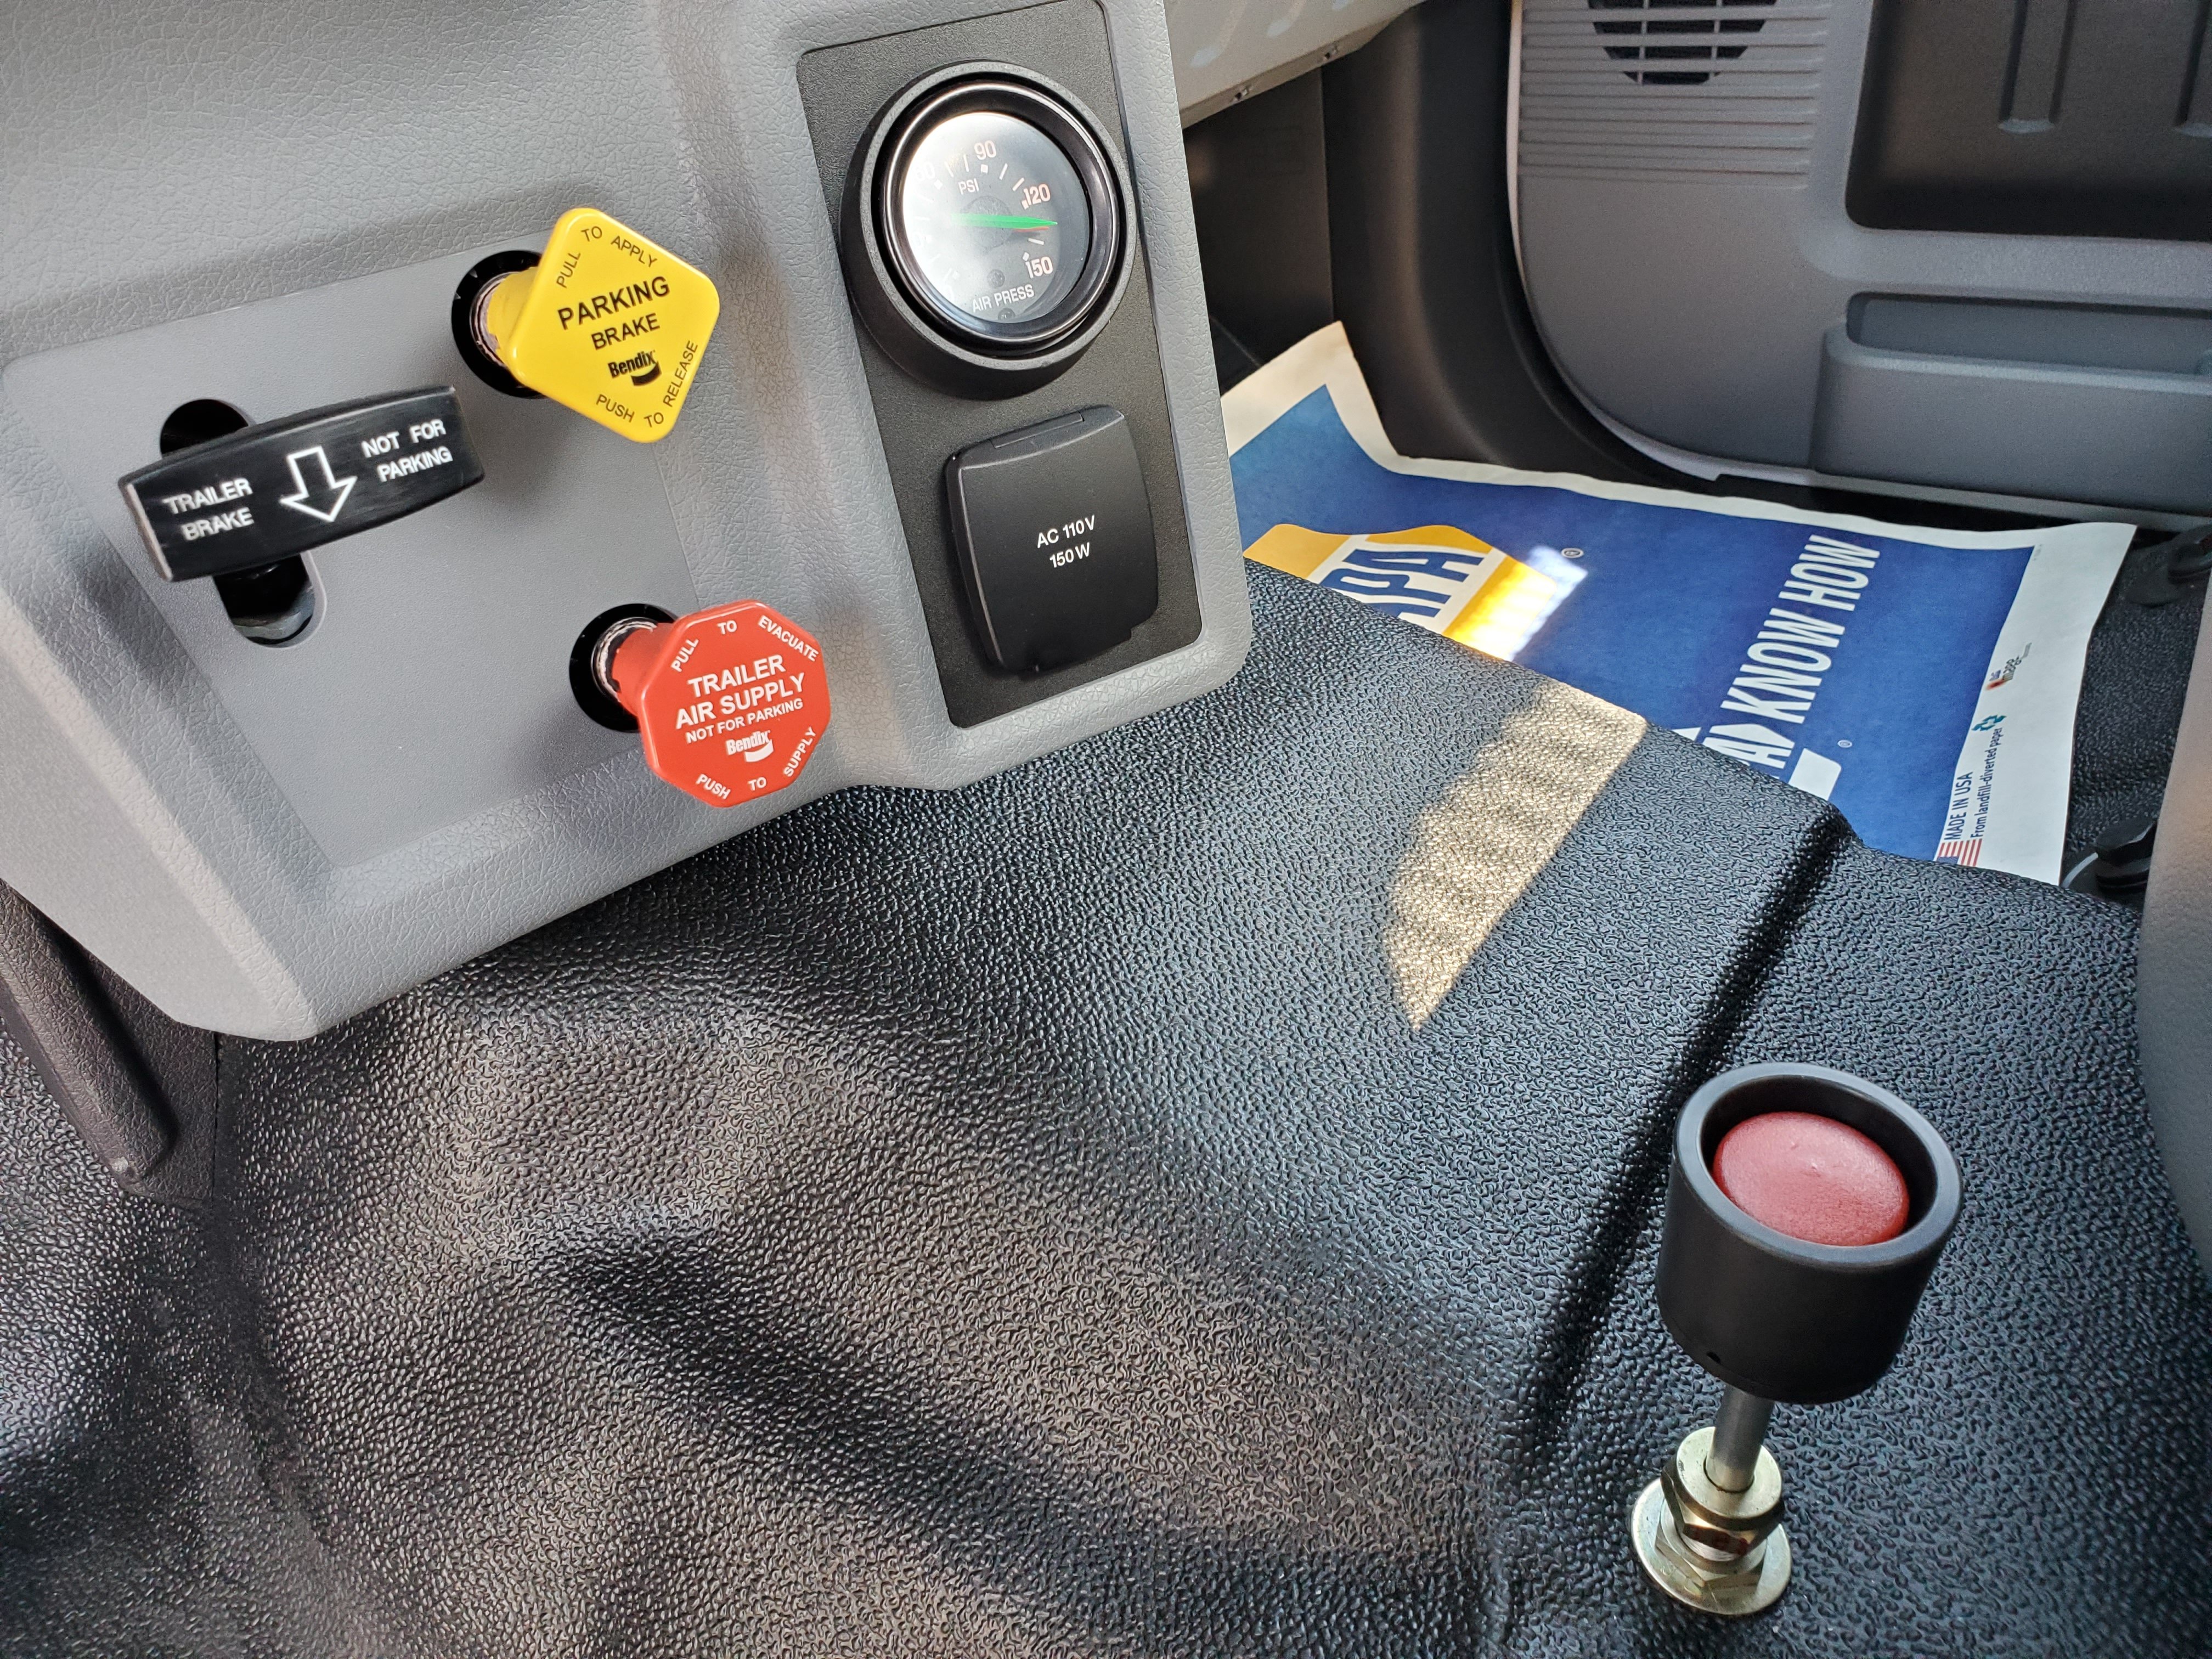 2019 F-750 Regular Cab DRW 4x2, Dump Body #KDF00088 - photo 11